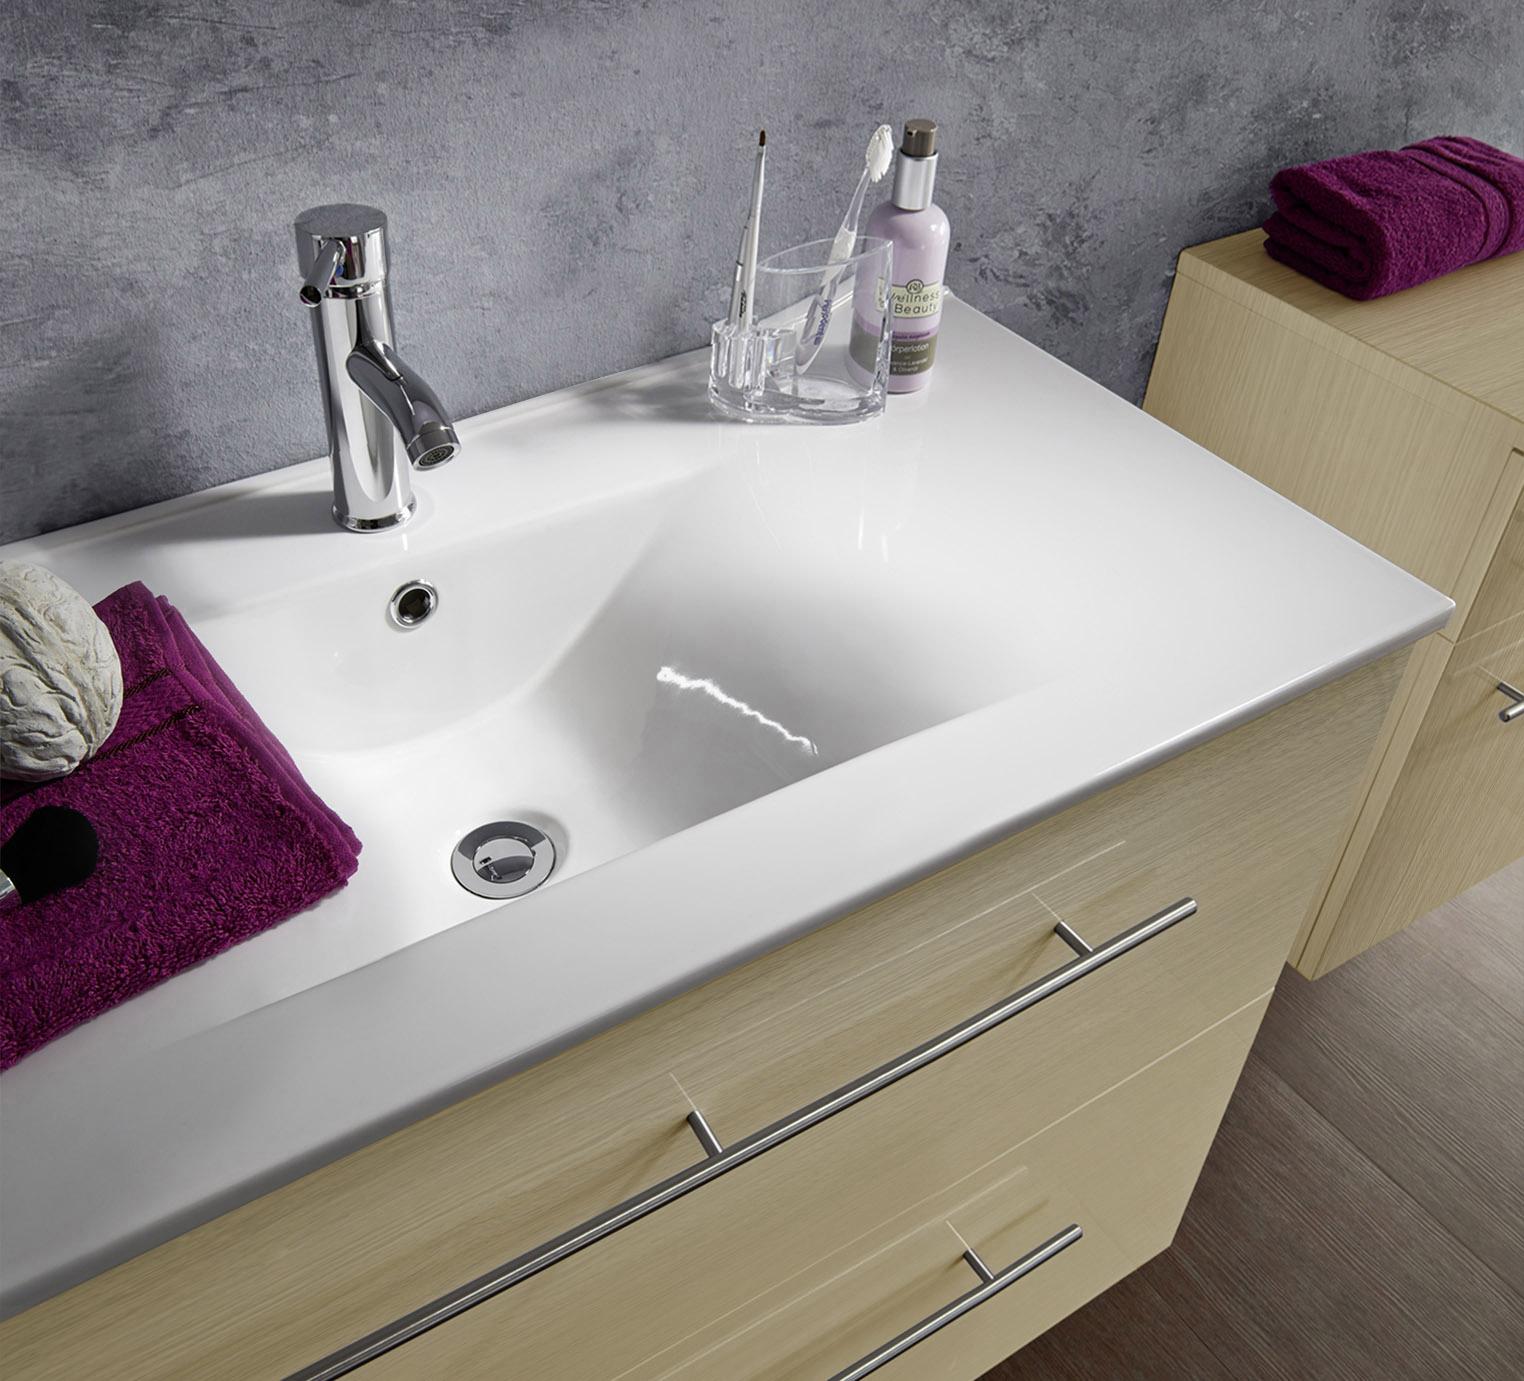 sam 4tlg badezimmer set sonomaeiche 80 cm verena auf lager. Black Bedroom Furniture Sets. Home Design Ideas